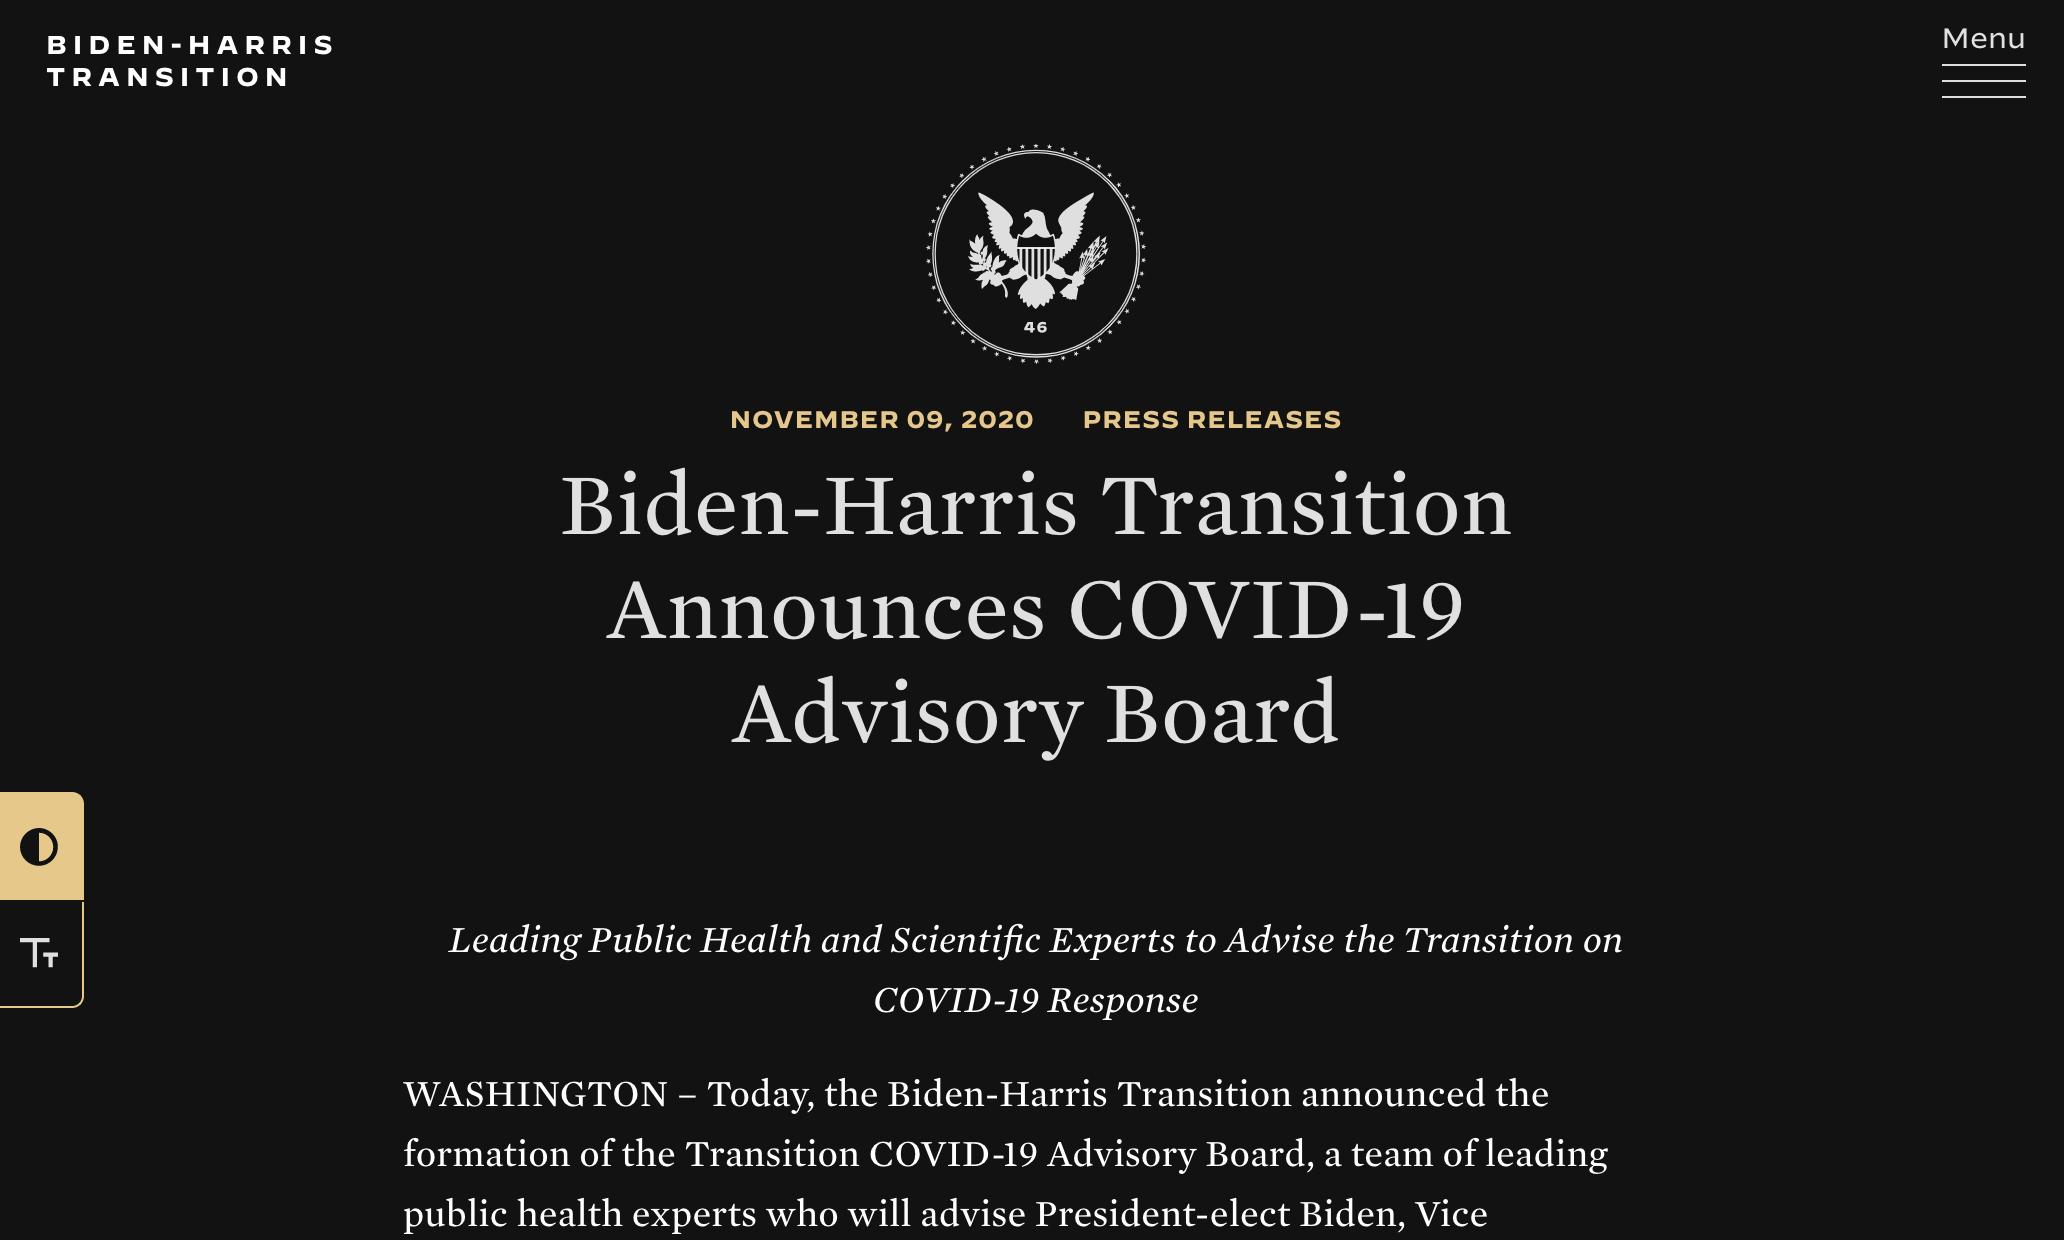 biden-harris-transition-website-launchches-on-wordpress-1拜登-哈里斯(Biden-Harris)过渡网站在WordPress上启动